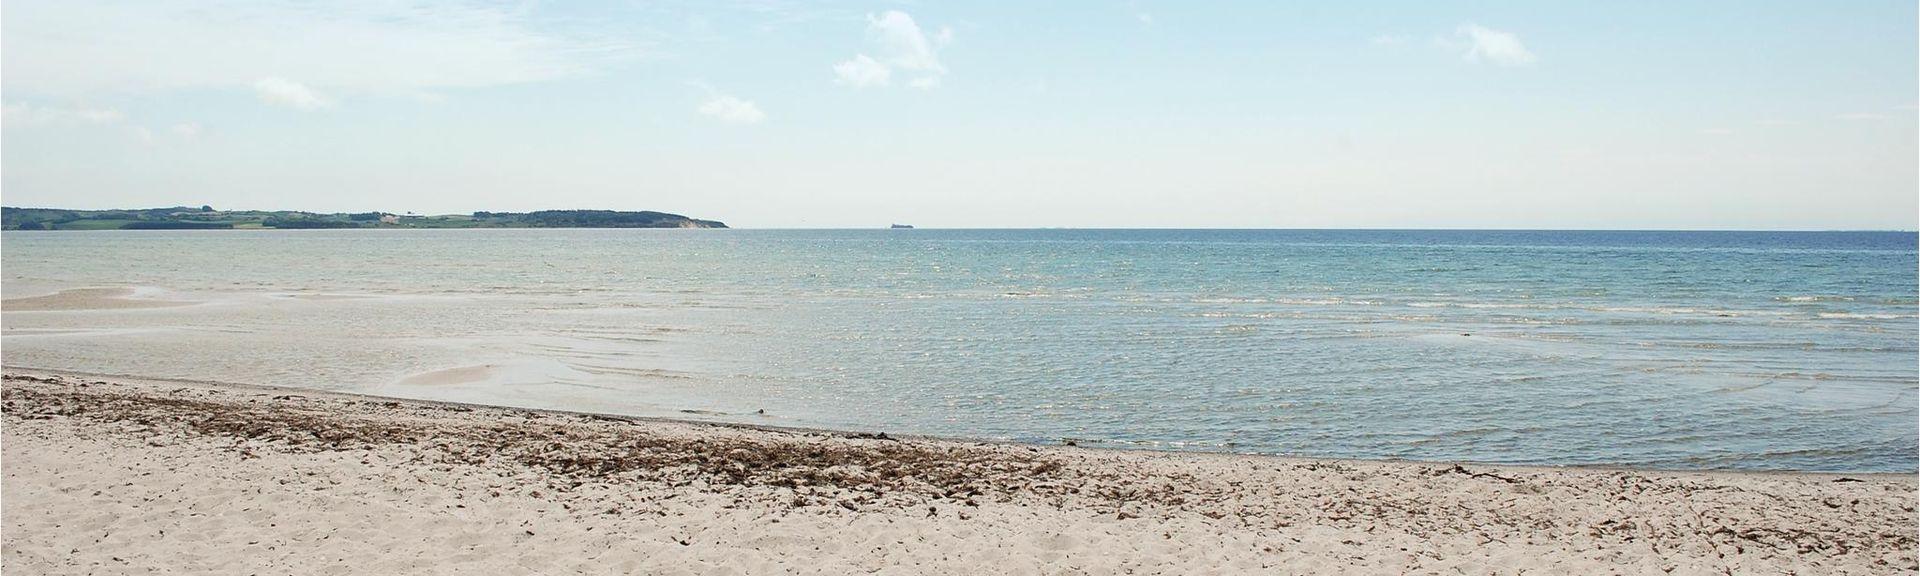 Ebeltoft strand, Ebeltoft, Region Midtjylland, Danmark